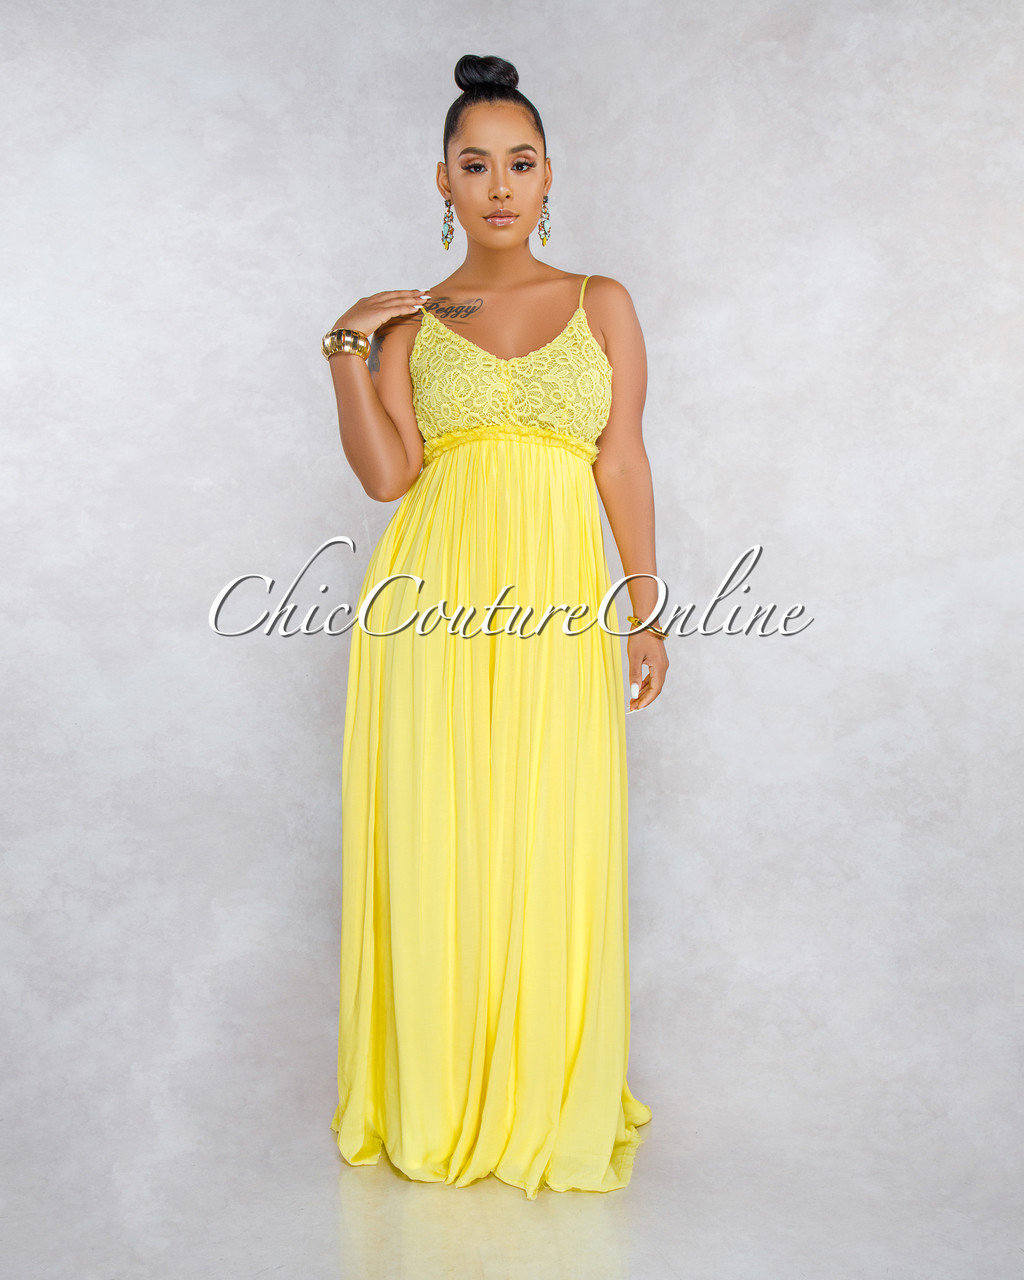 0b8f7ed9527c ... Crochet Top Open Back Maxi Dress. Price: $50.00. Image 1. Larger / More  Photos